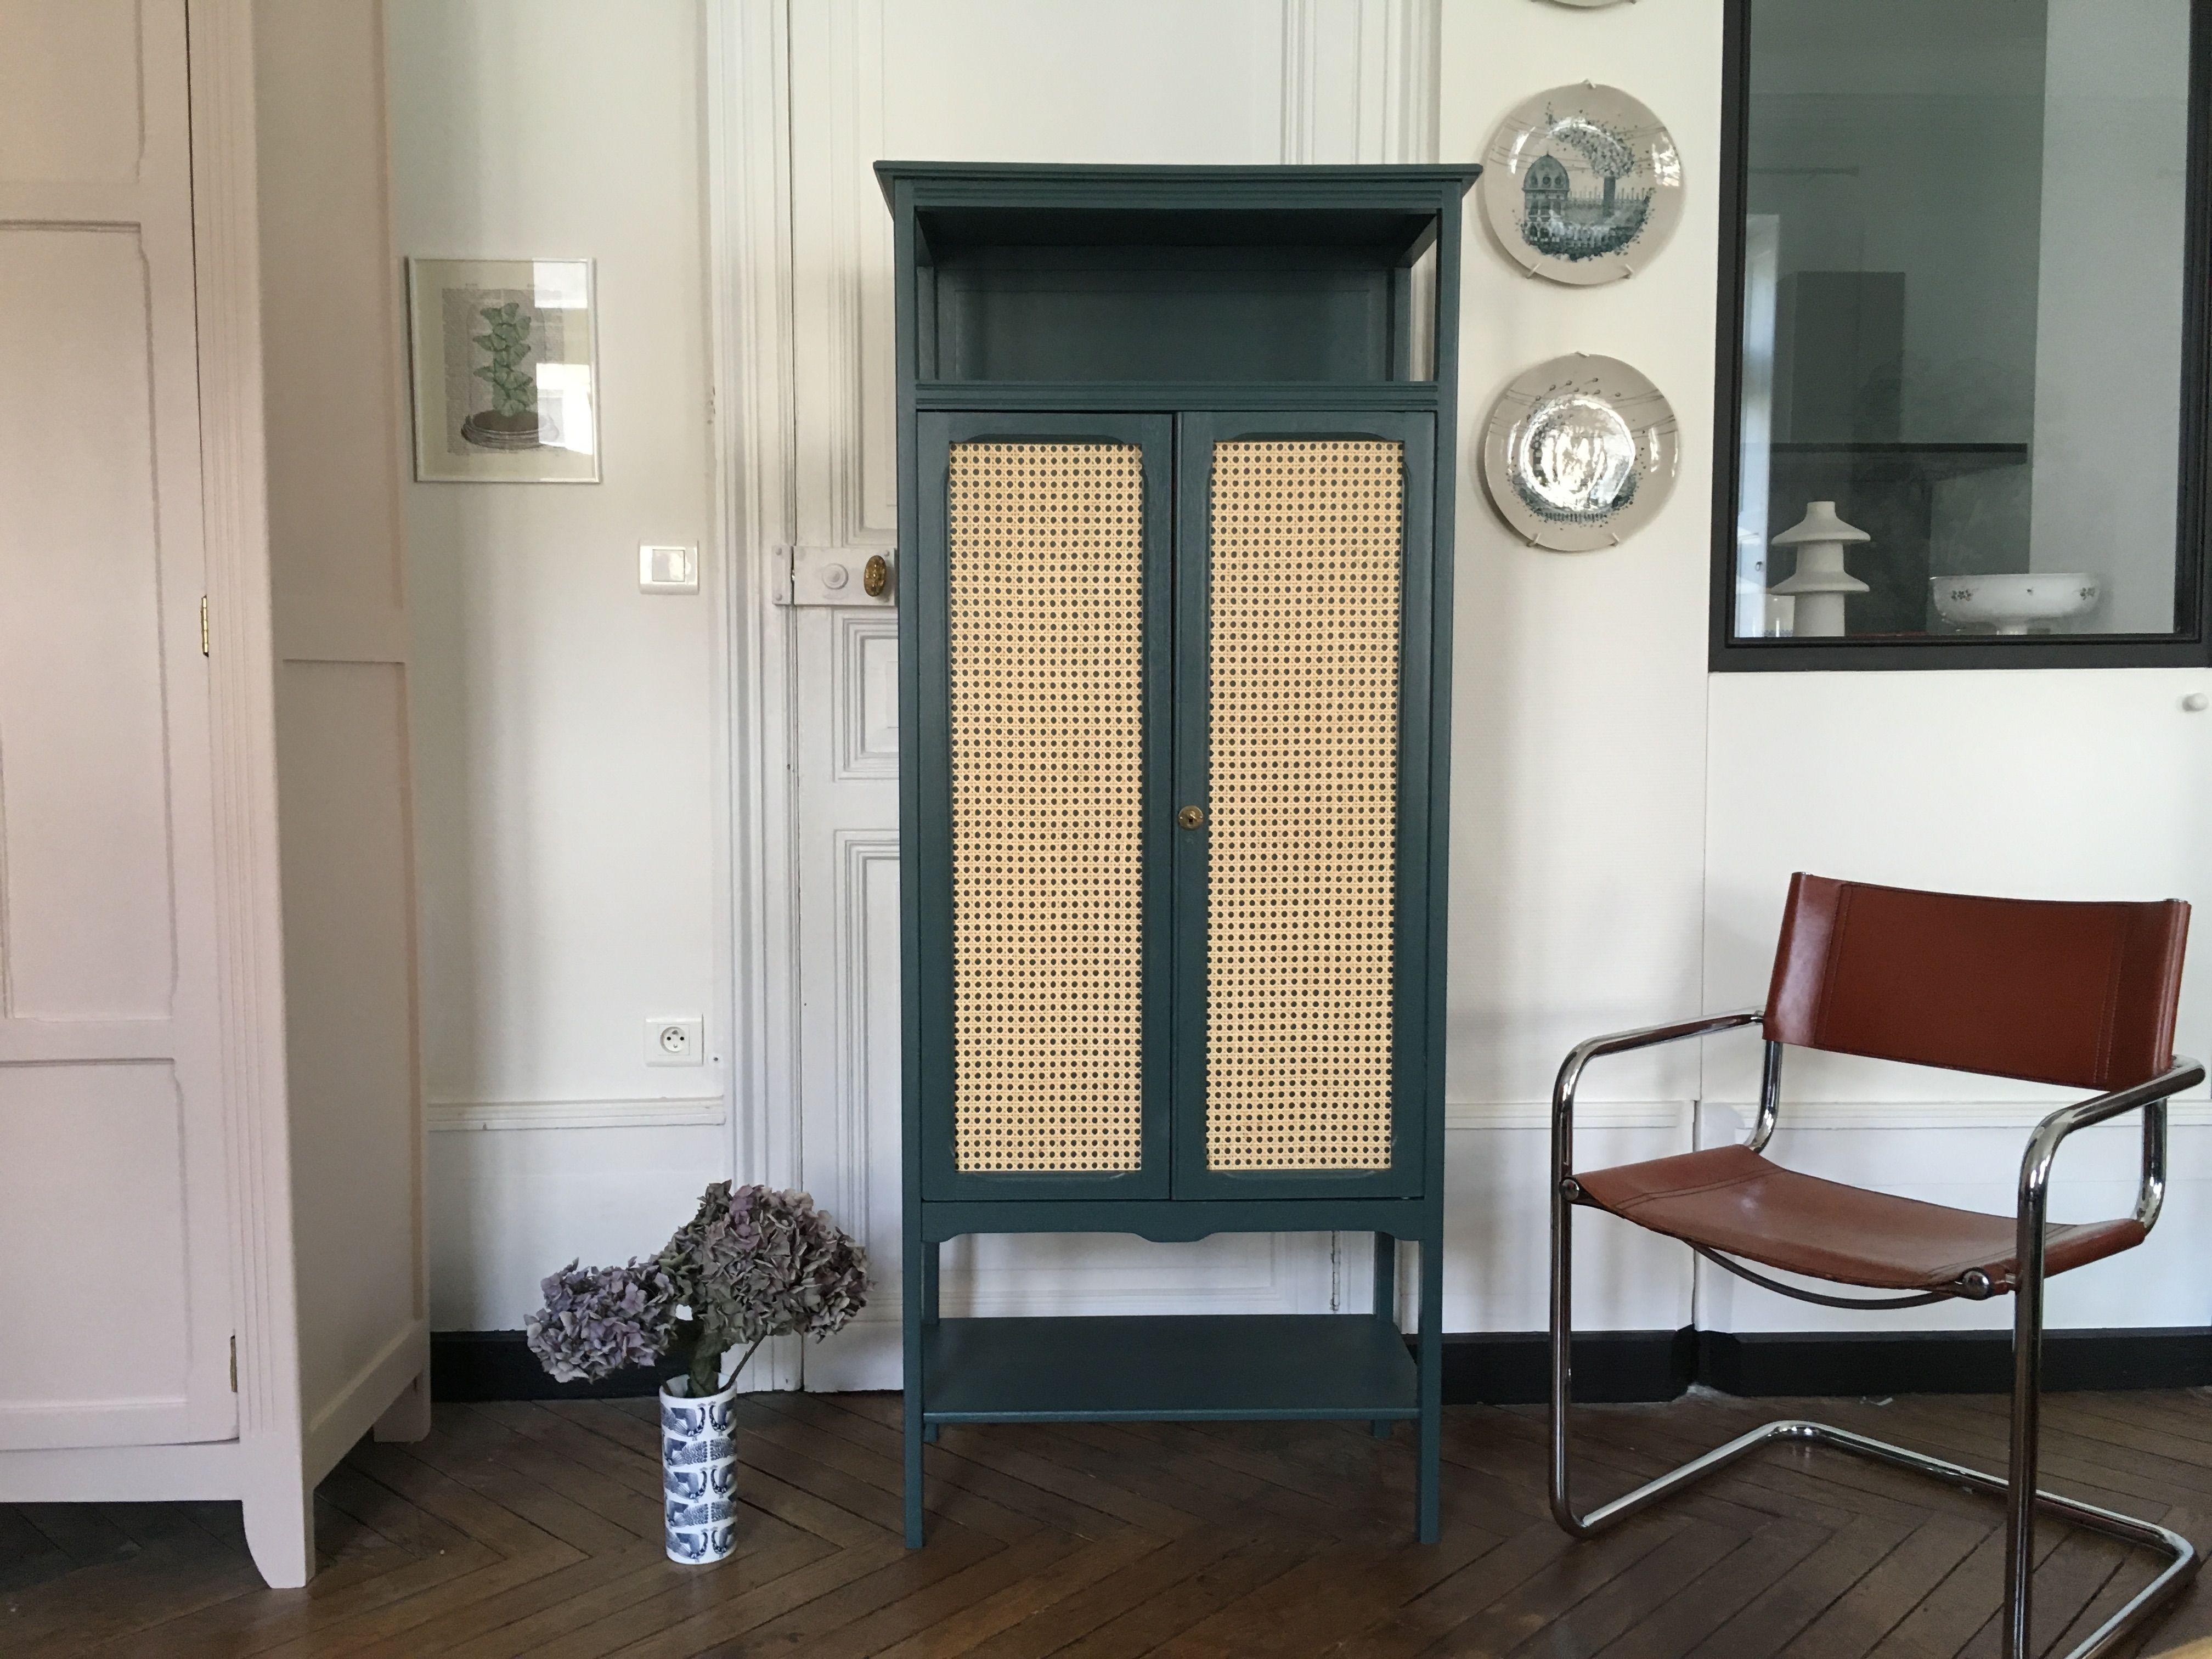 Armoire En Cannage Bleu Vert Meubles Vintage Nantes Relooking Meuble Mobilier De Salon Diy Meuble